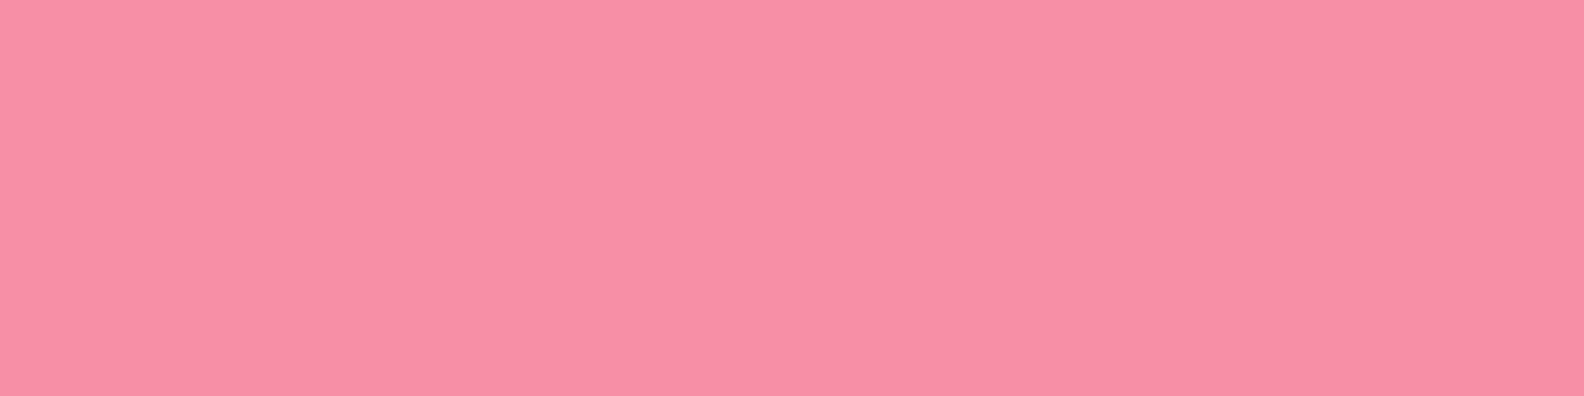 1584x396 Pink Sherbet Solid Color Background